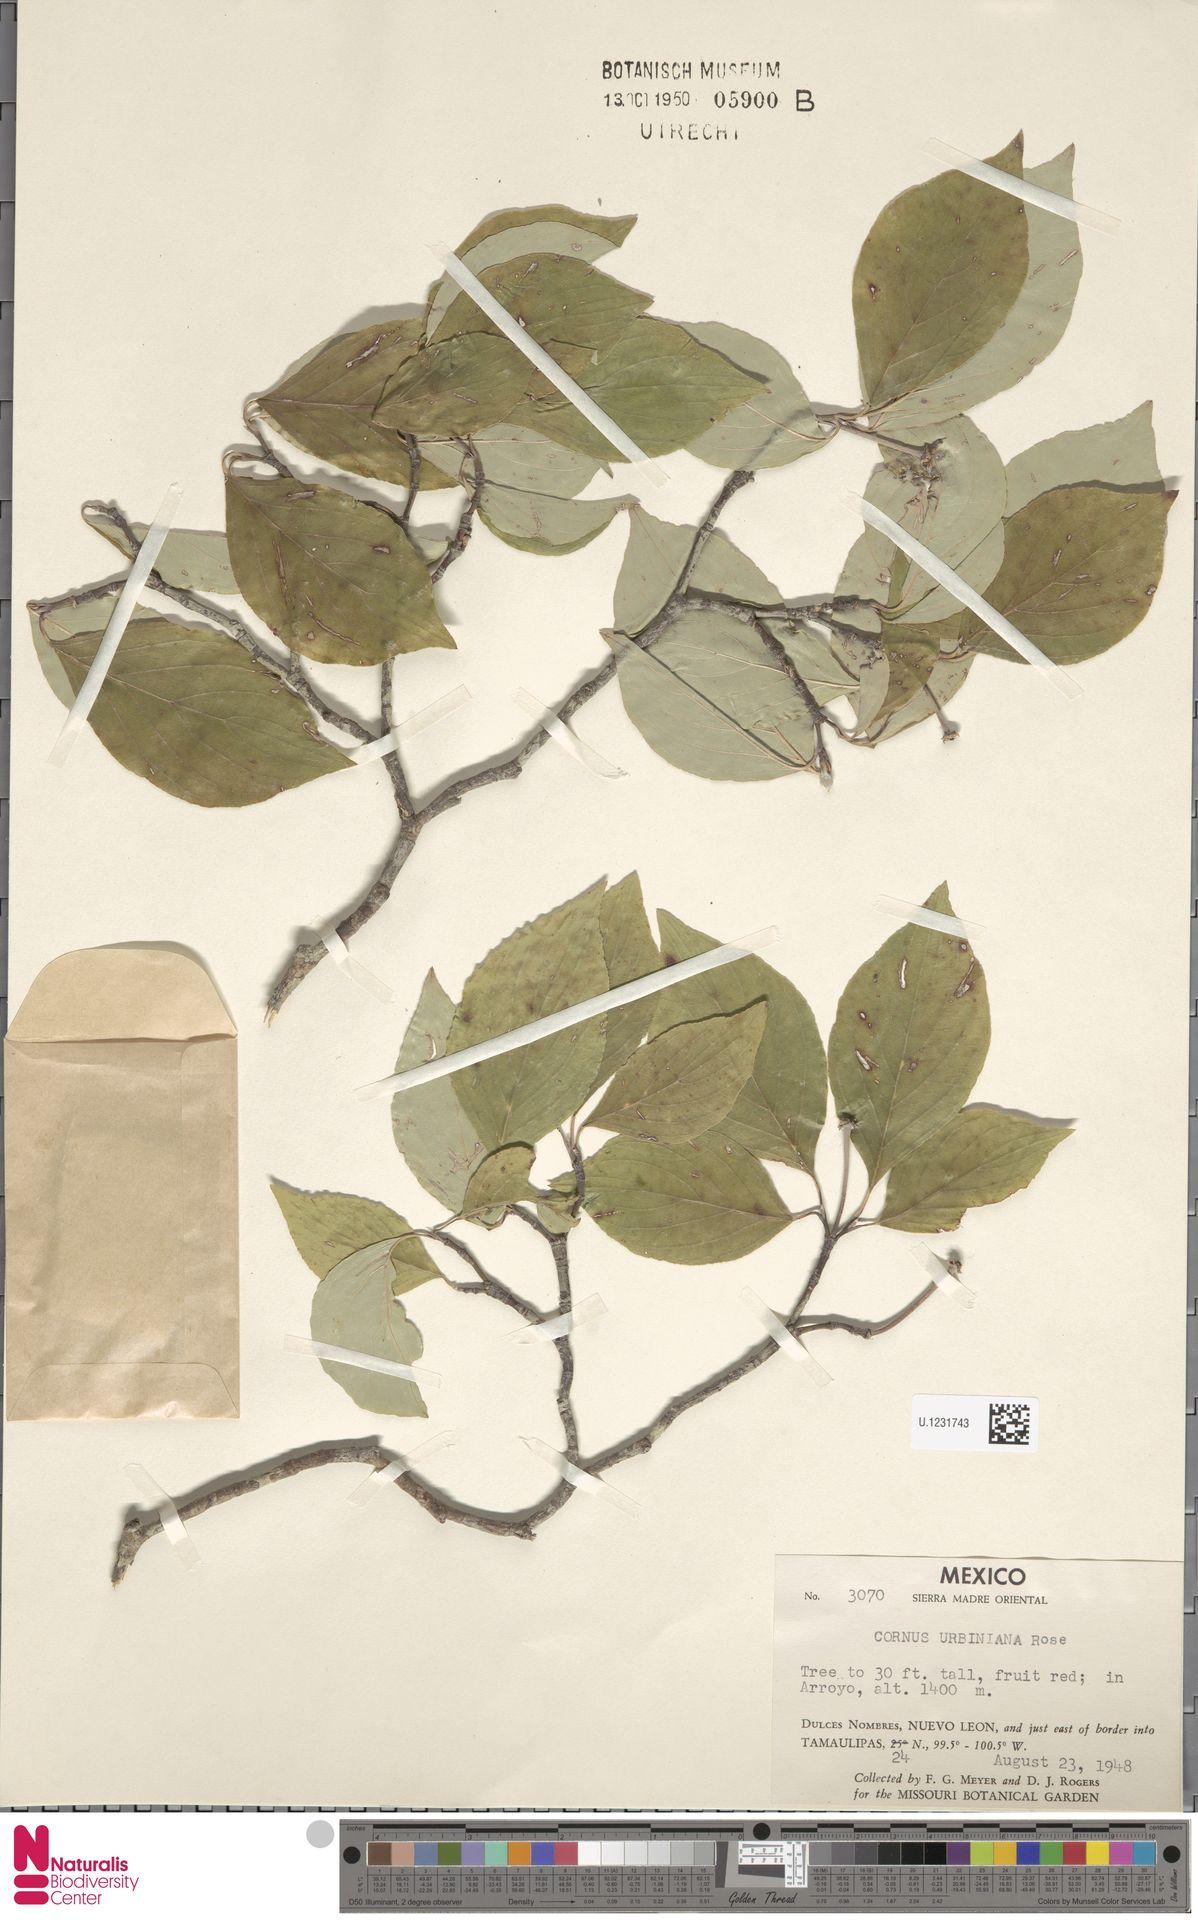 U.1231743 | Cornus urbiniana Rose